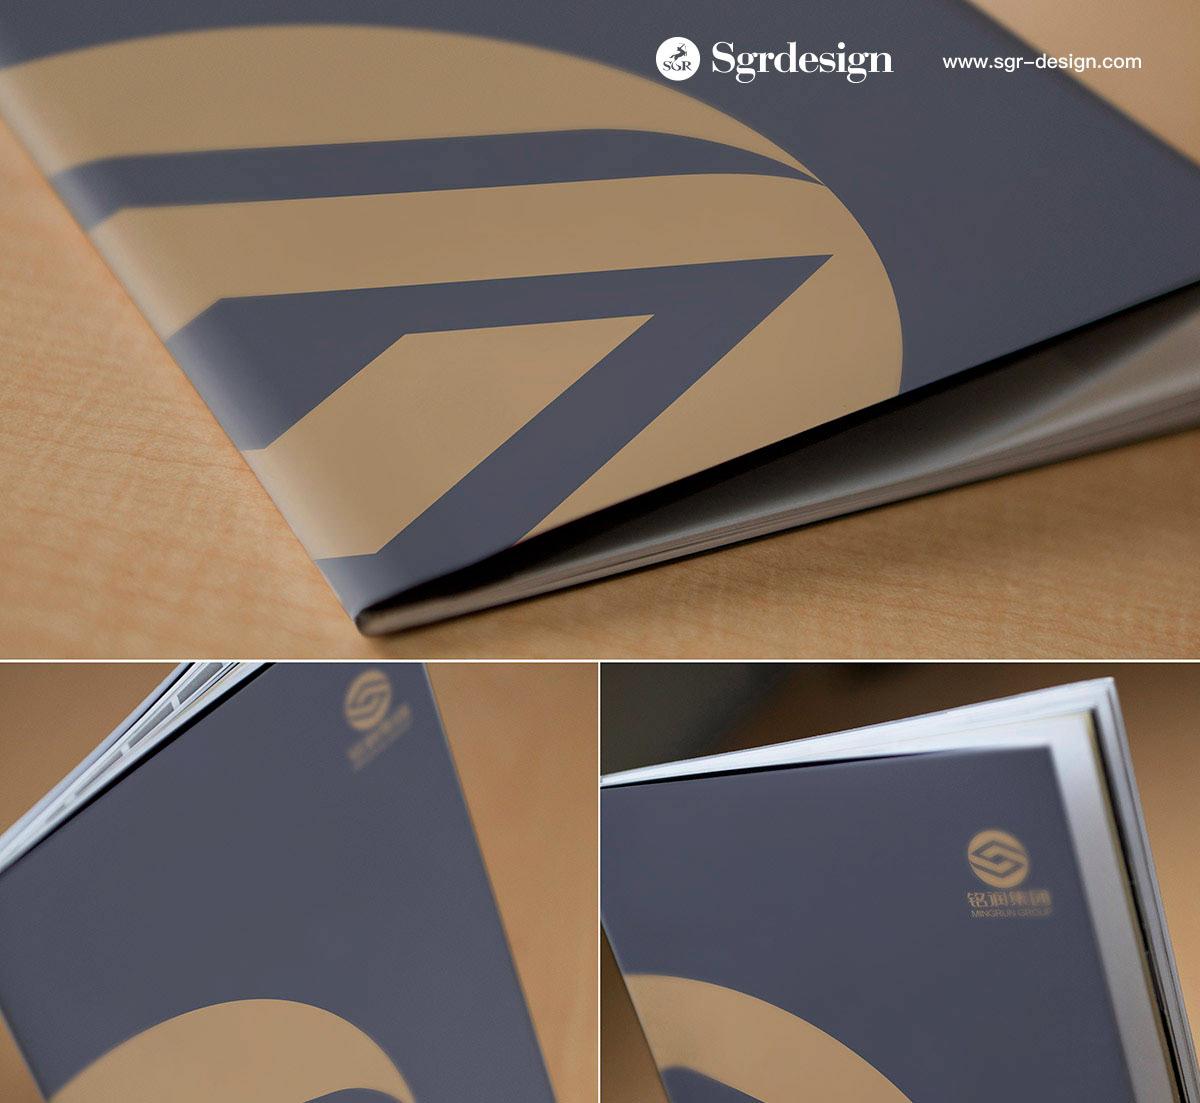 Catalogue brand sgr design real estate brochure 品牌 画册 宣传册 设计